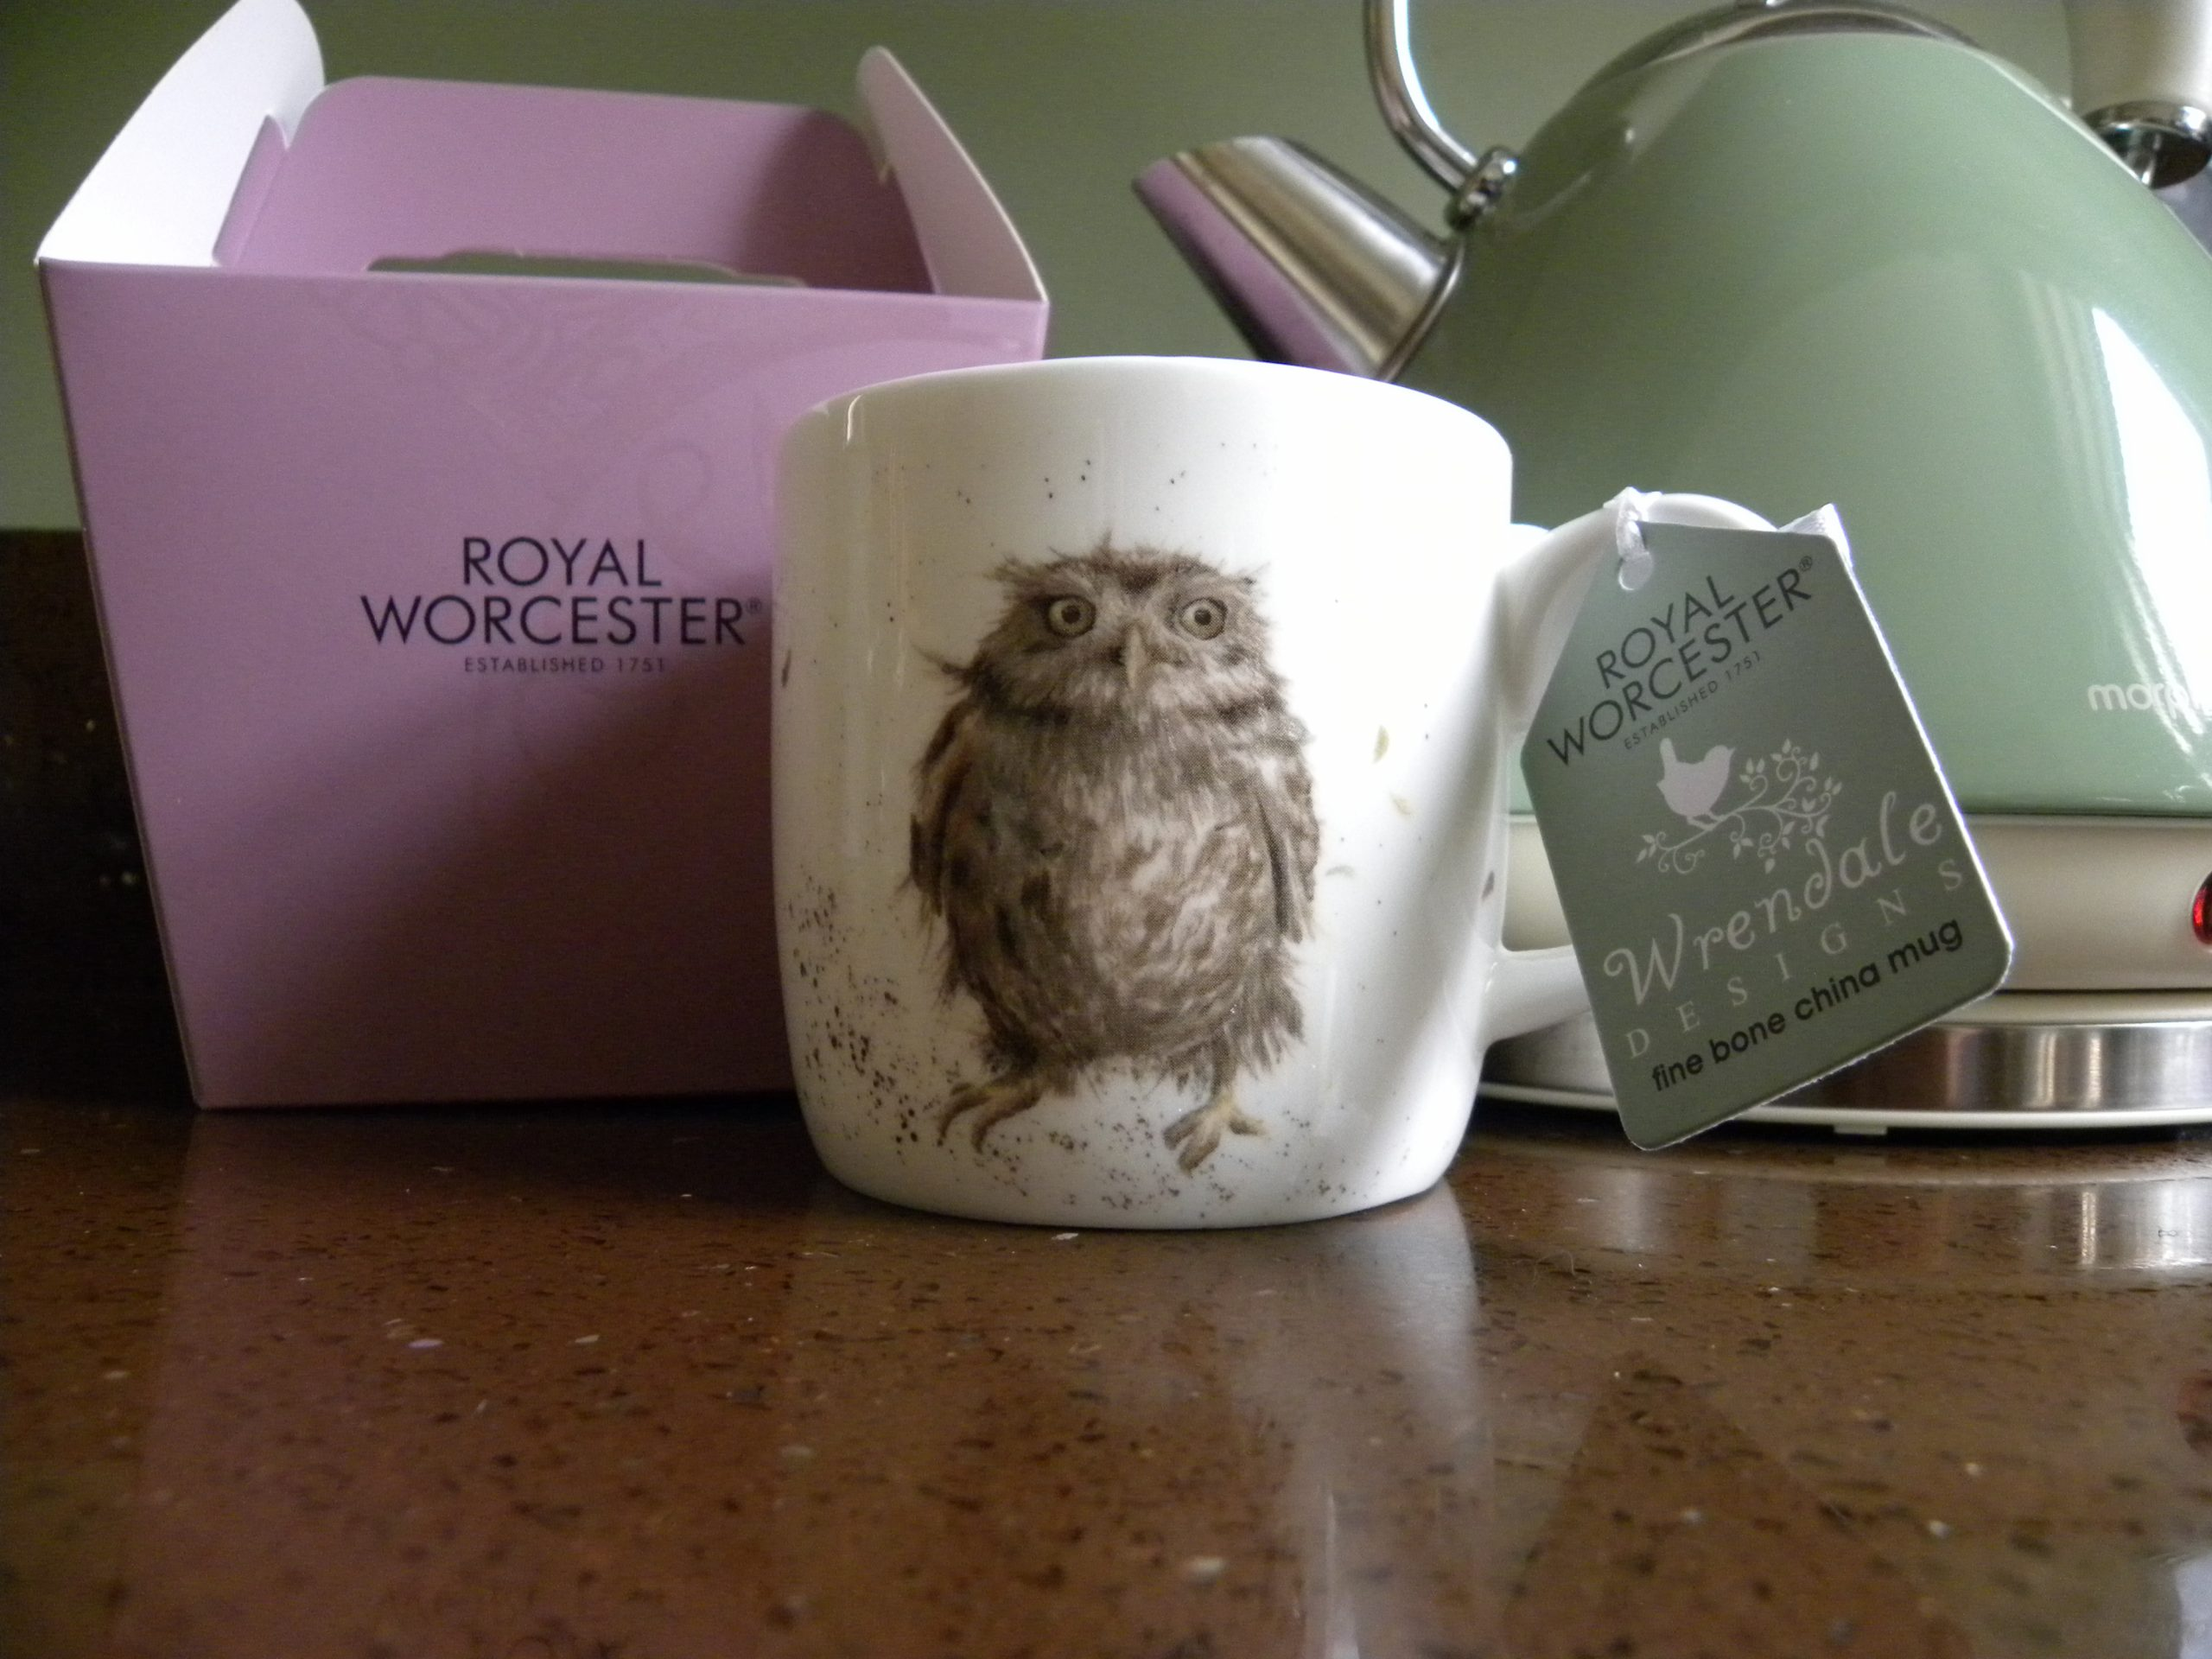 Royal Worcester - Wrendale - Bone China Mug - What a Hoot, Tawny Owl